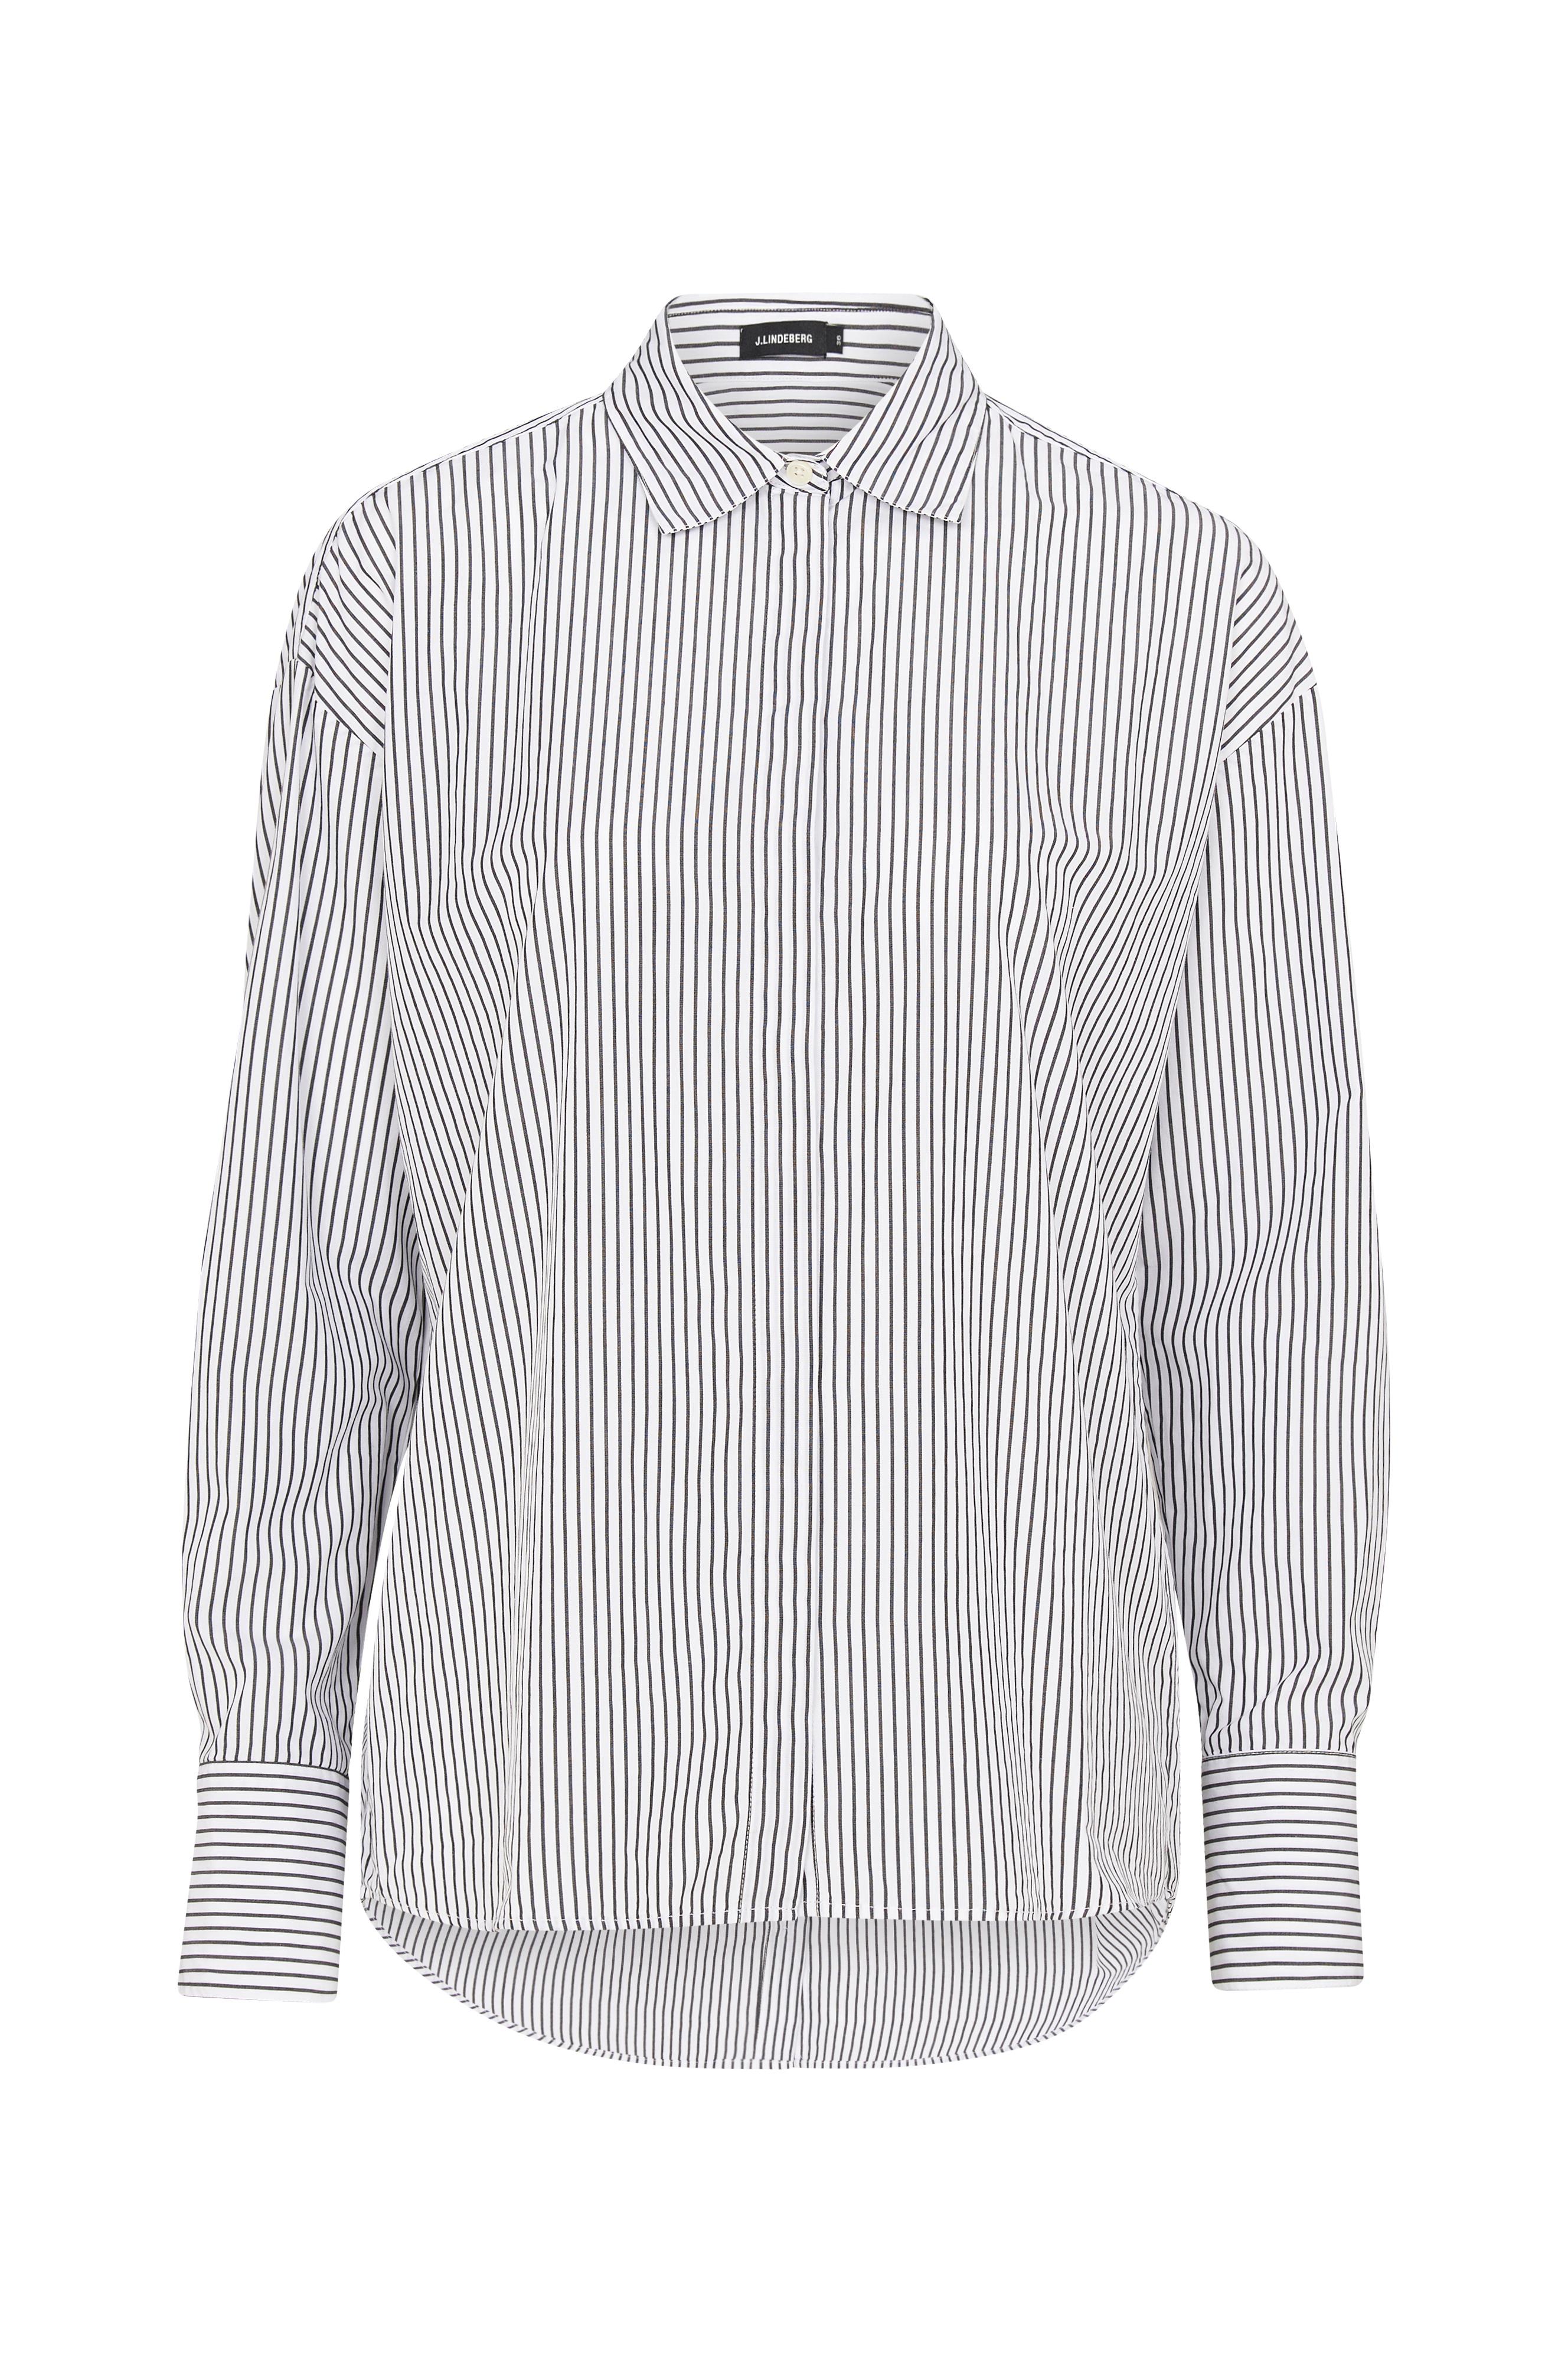 J.Lindeberg Skjorta Nicole Poplin Stripe Shirt - Svart - Dam - Ellos.se ec4228ca0e533